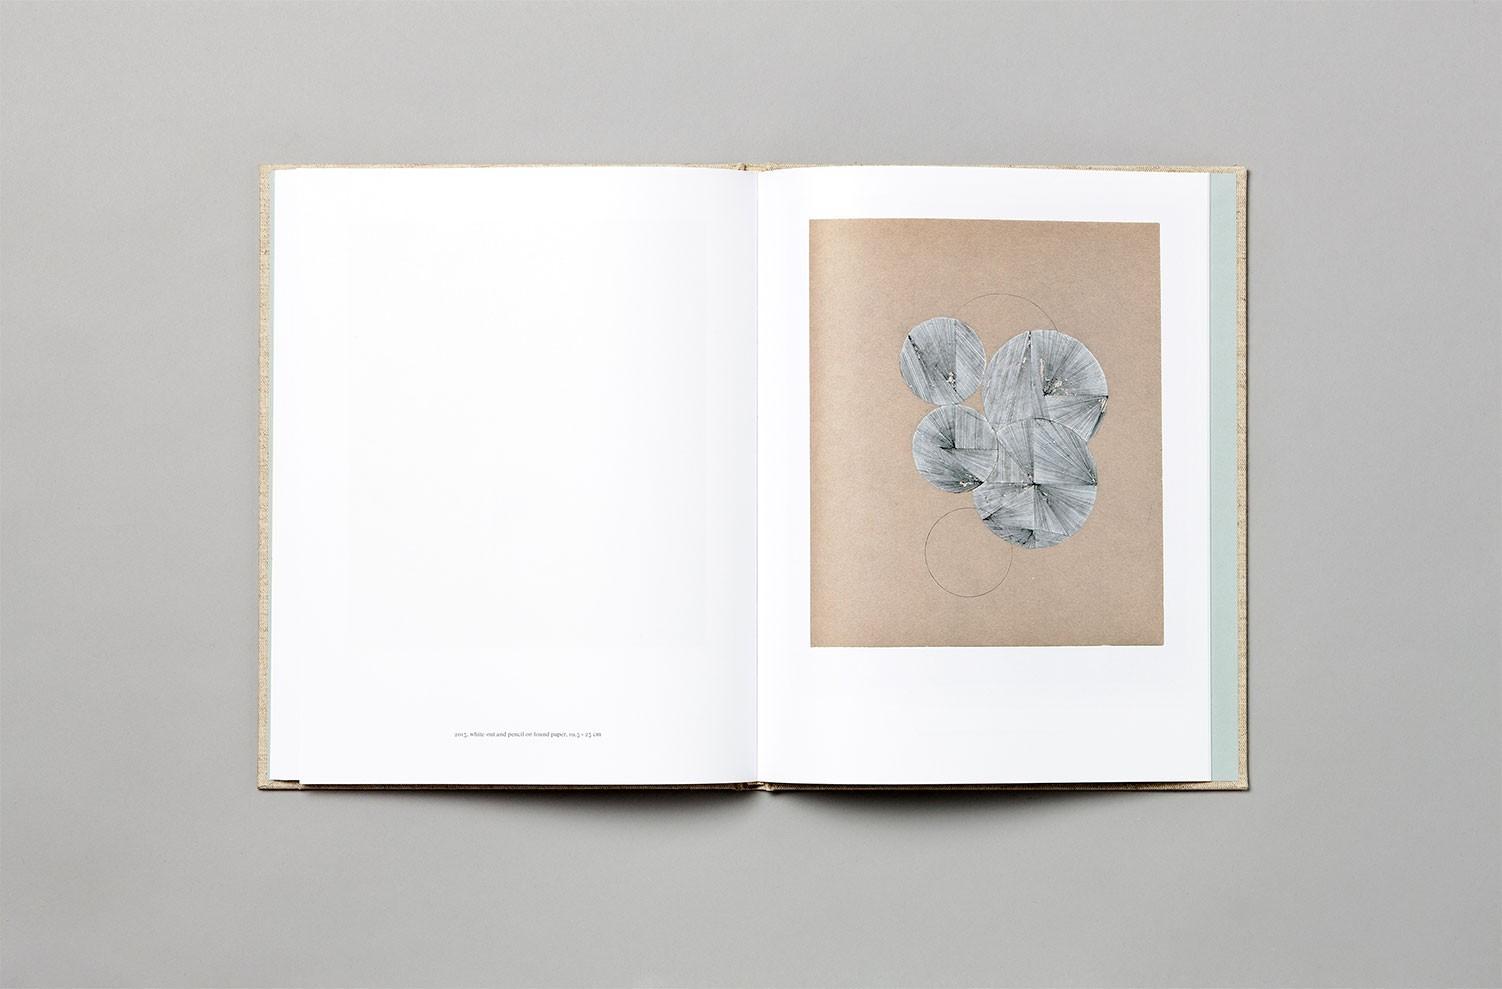 ritator_hans_andersson_artist_book_8